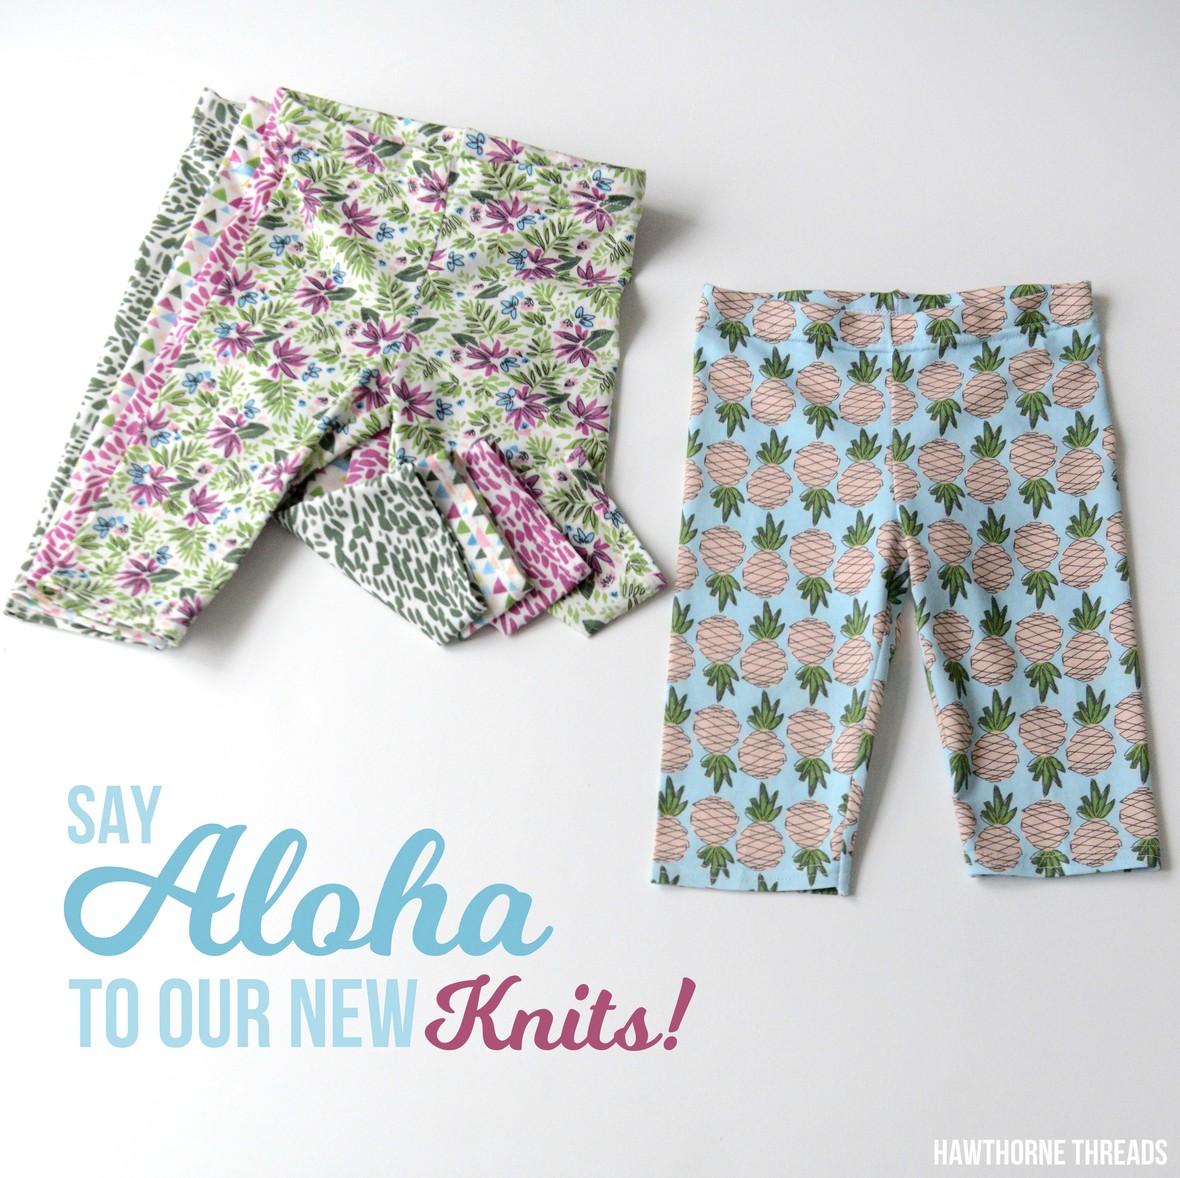 Aloha Hawthorne Jersey Knits Promo